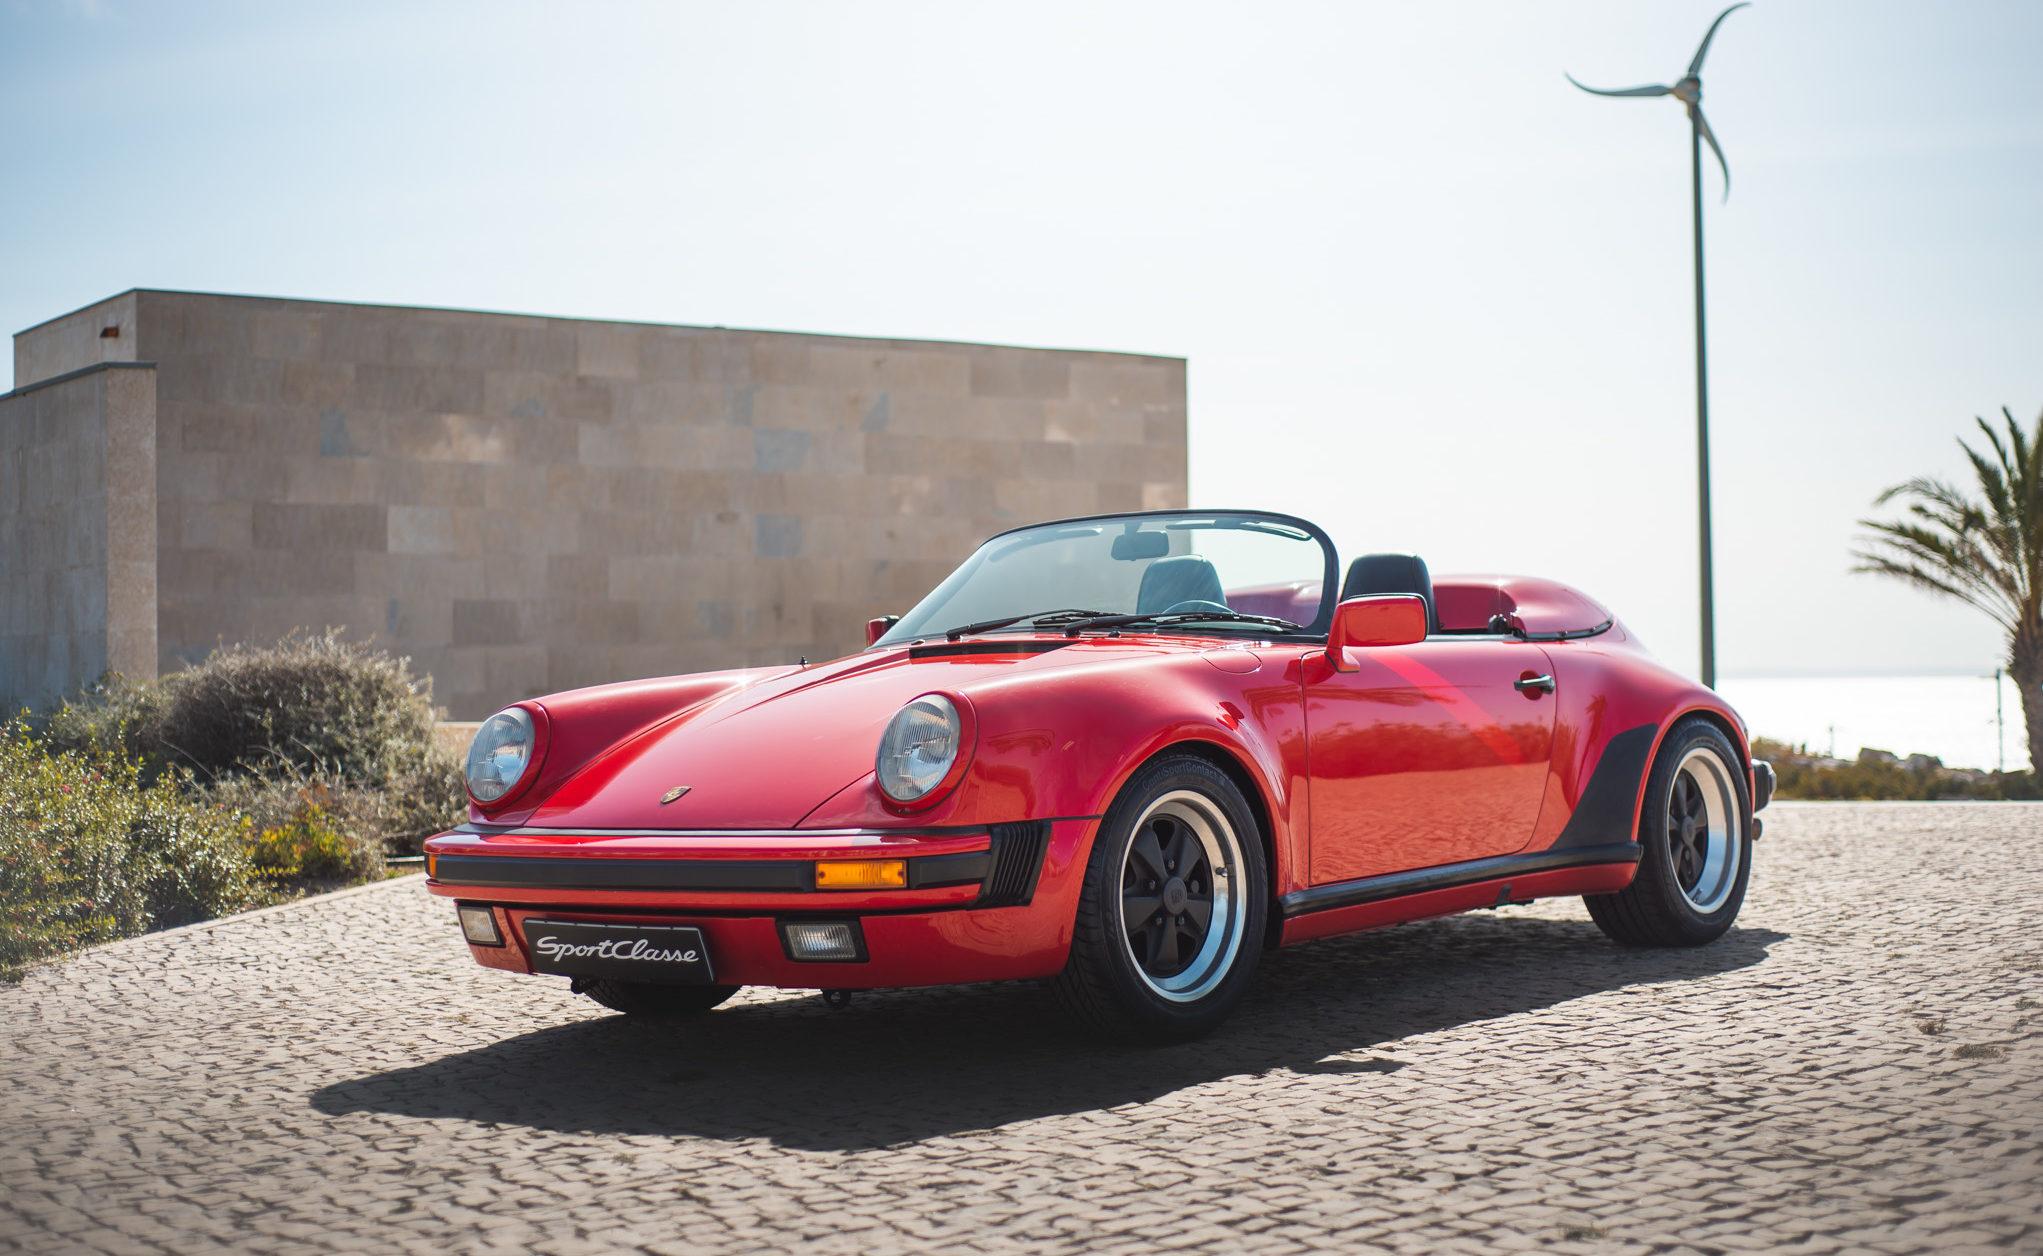 Porsche 911 Speedster (1989)